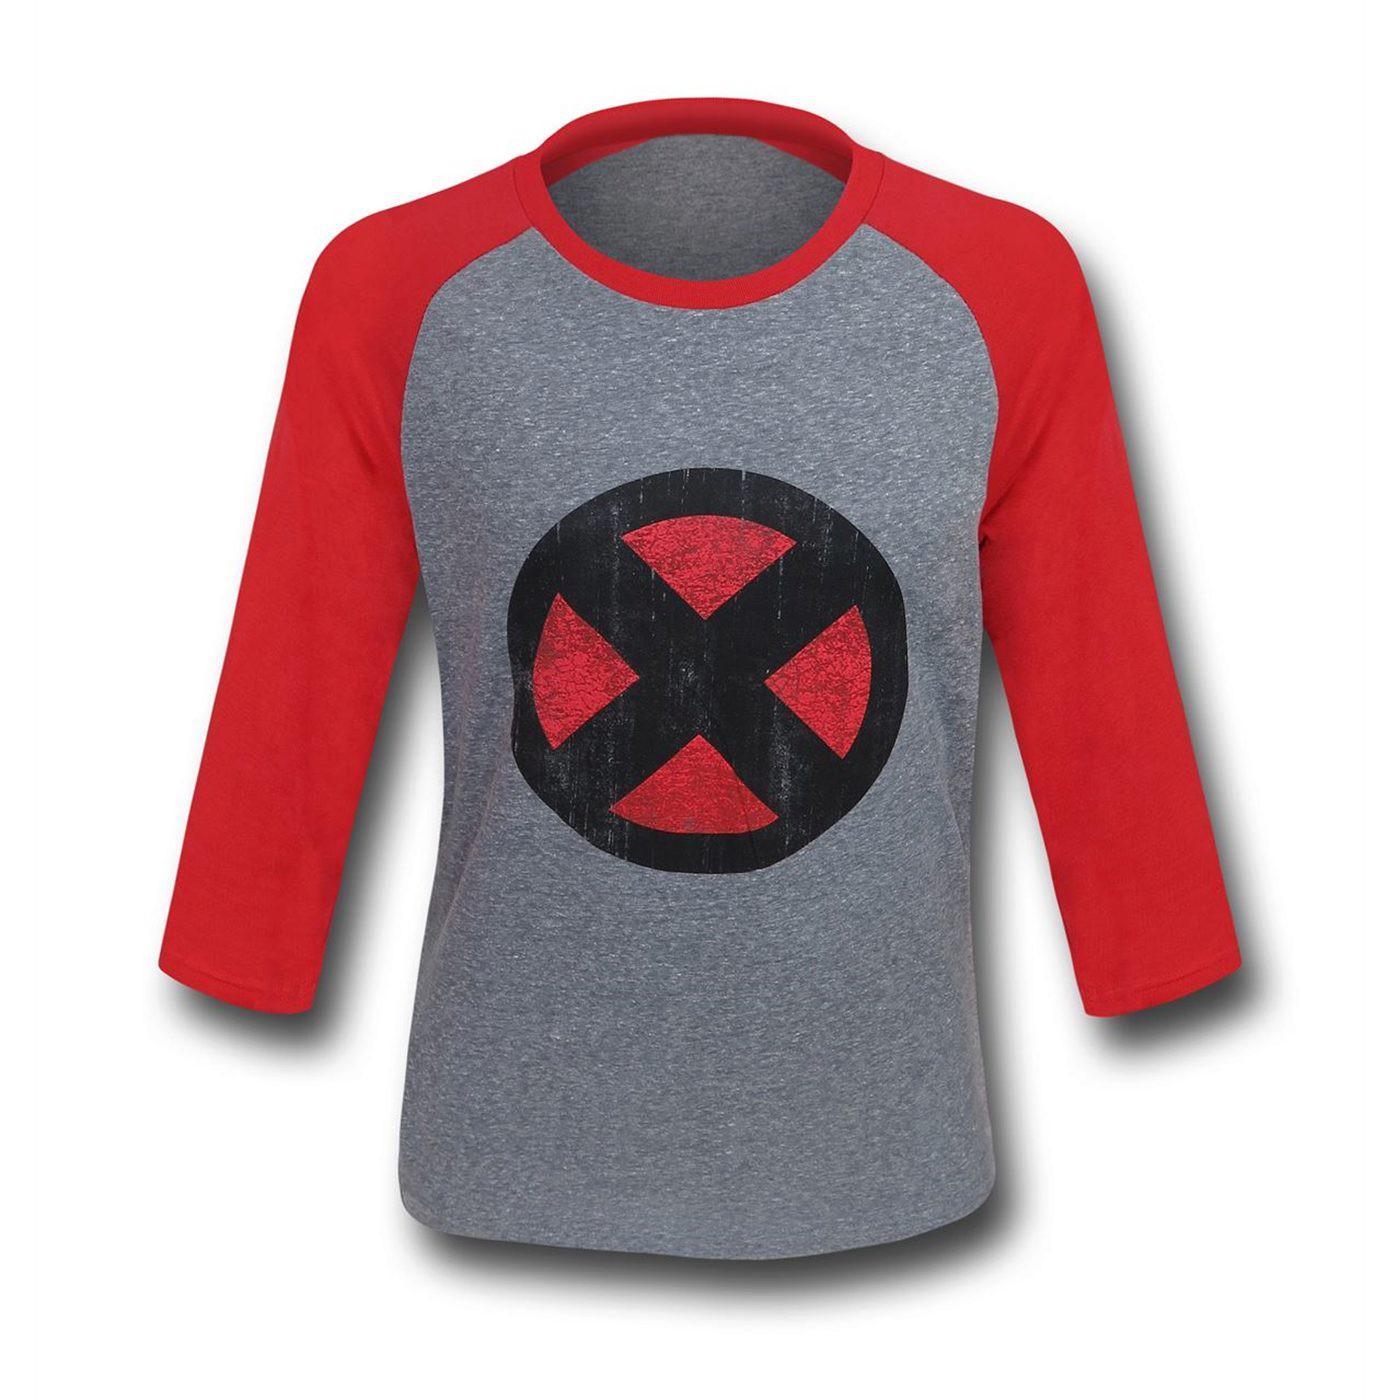 X-Men Distressed Symbol Men's Baseball T-Shirt